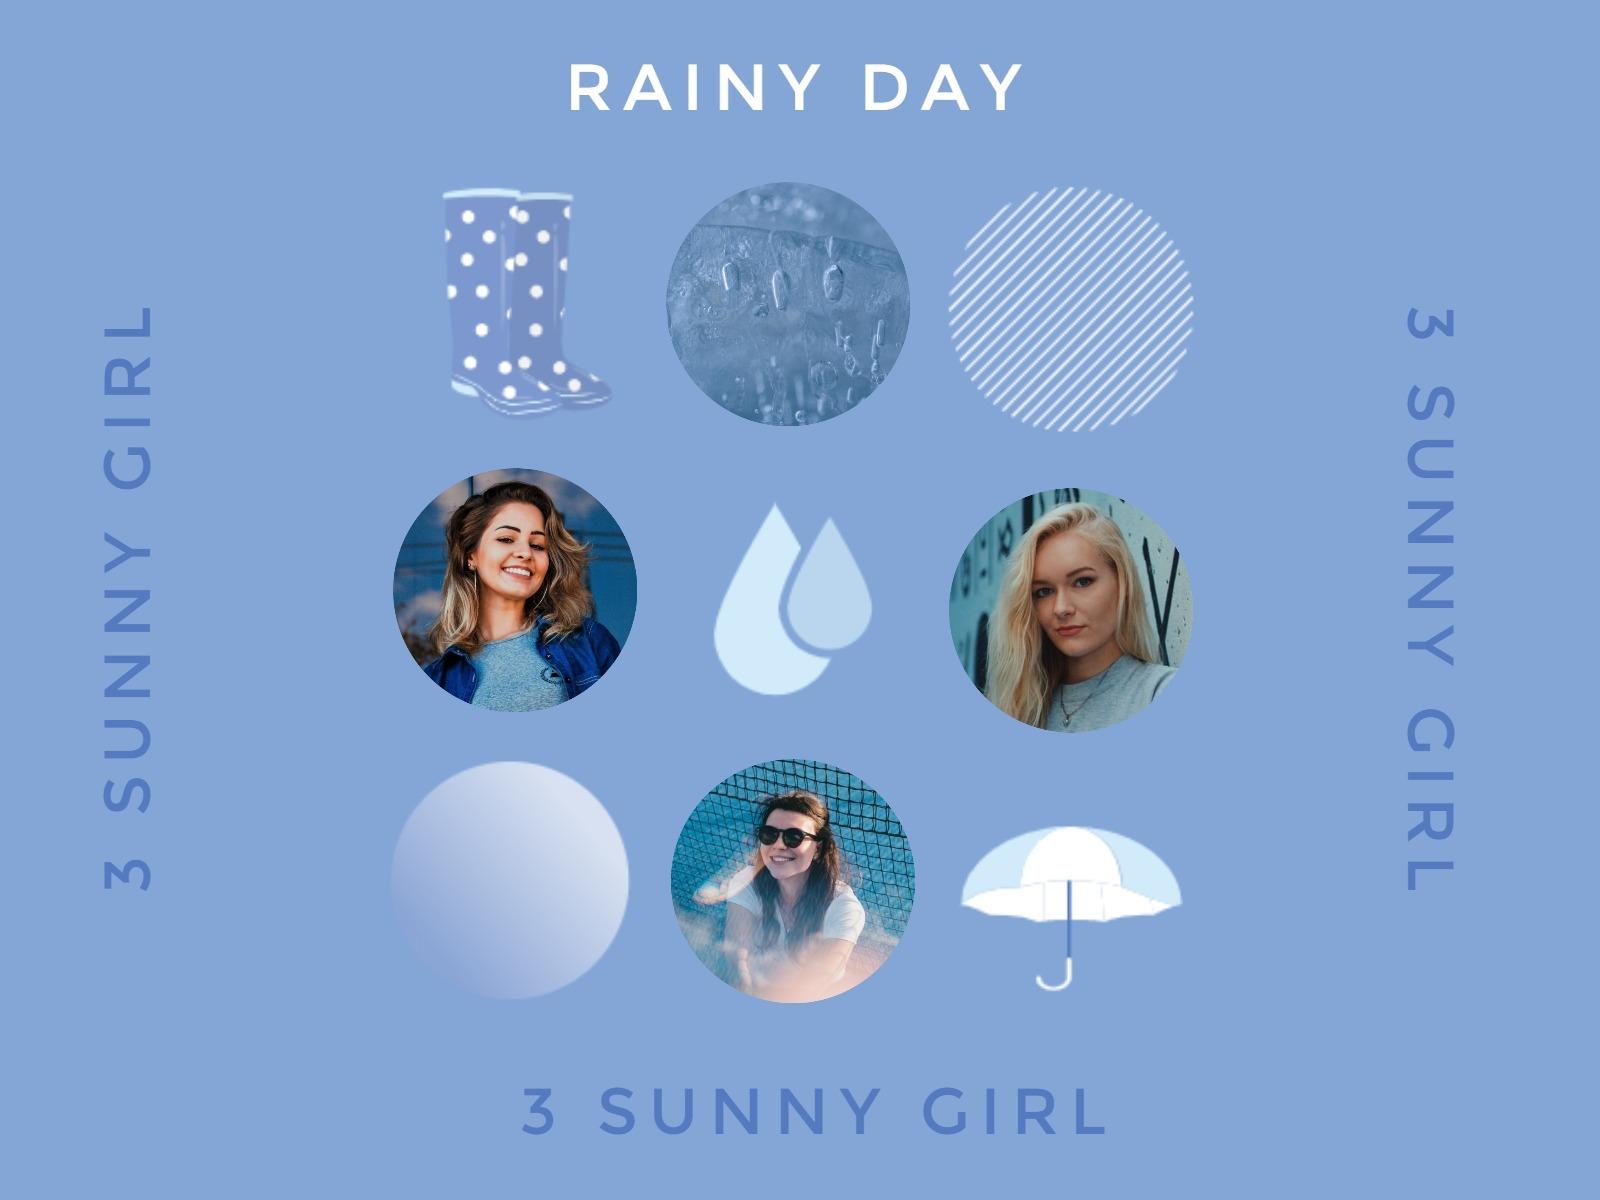 rainy3_wl_20200116